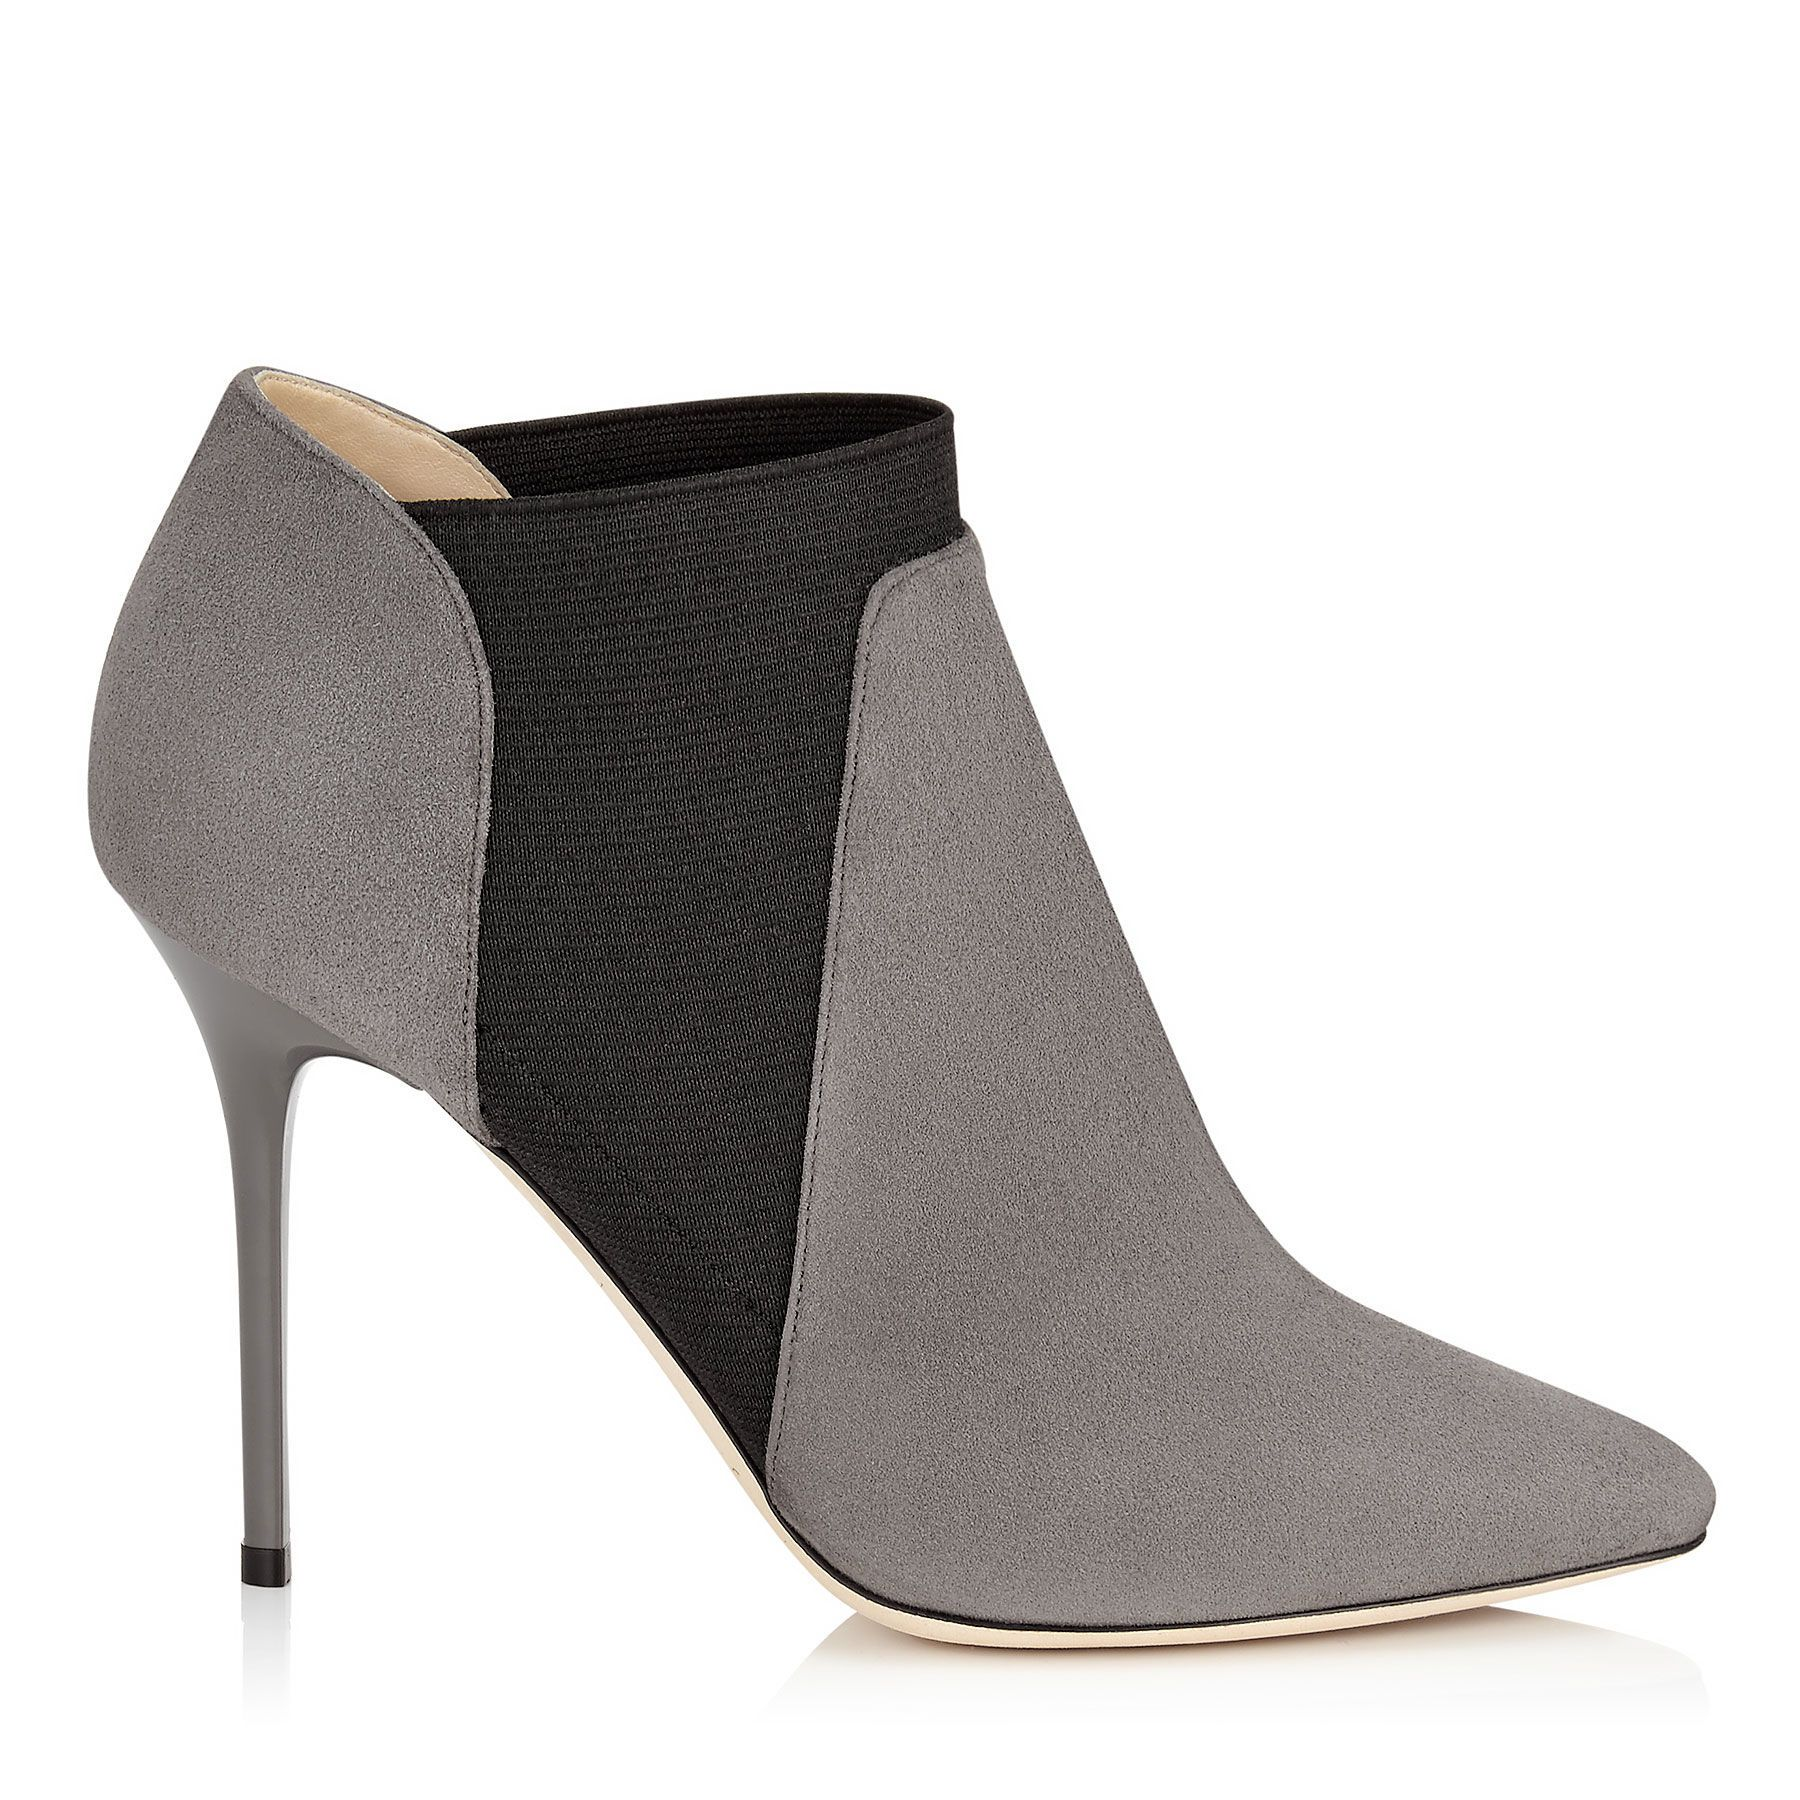 Mist Suede Stretch Ankle Boots | Declan 100 | Autumn Winter 15 | JIMMY CHOO